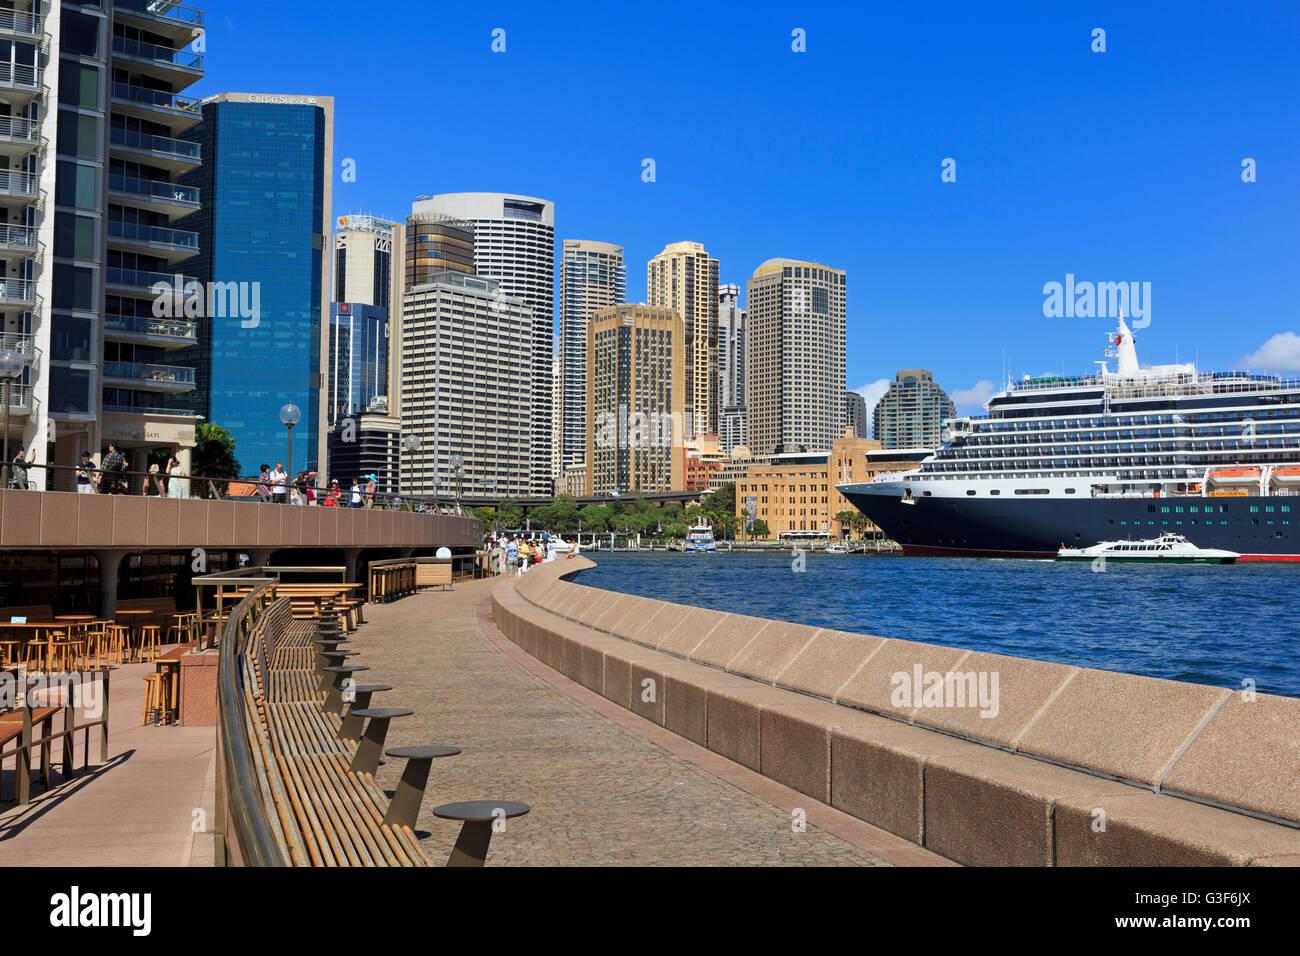 Circular Quay, Sydney, New South Wales, Australia - Stock Image